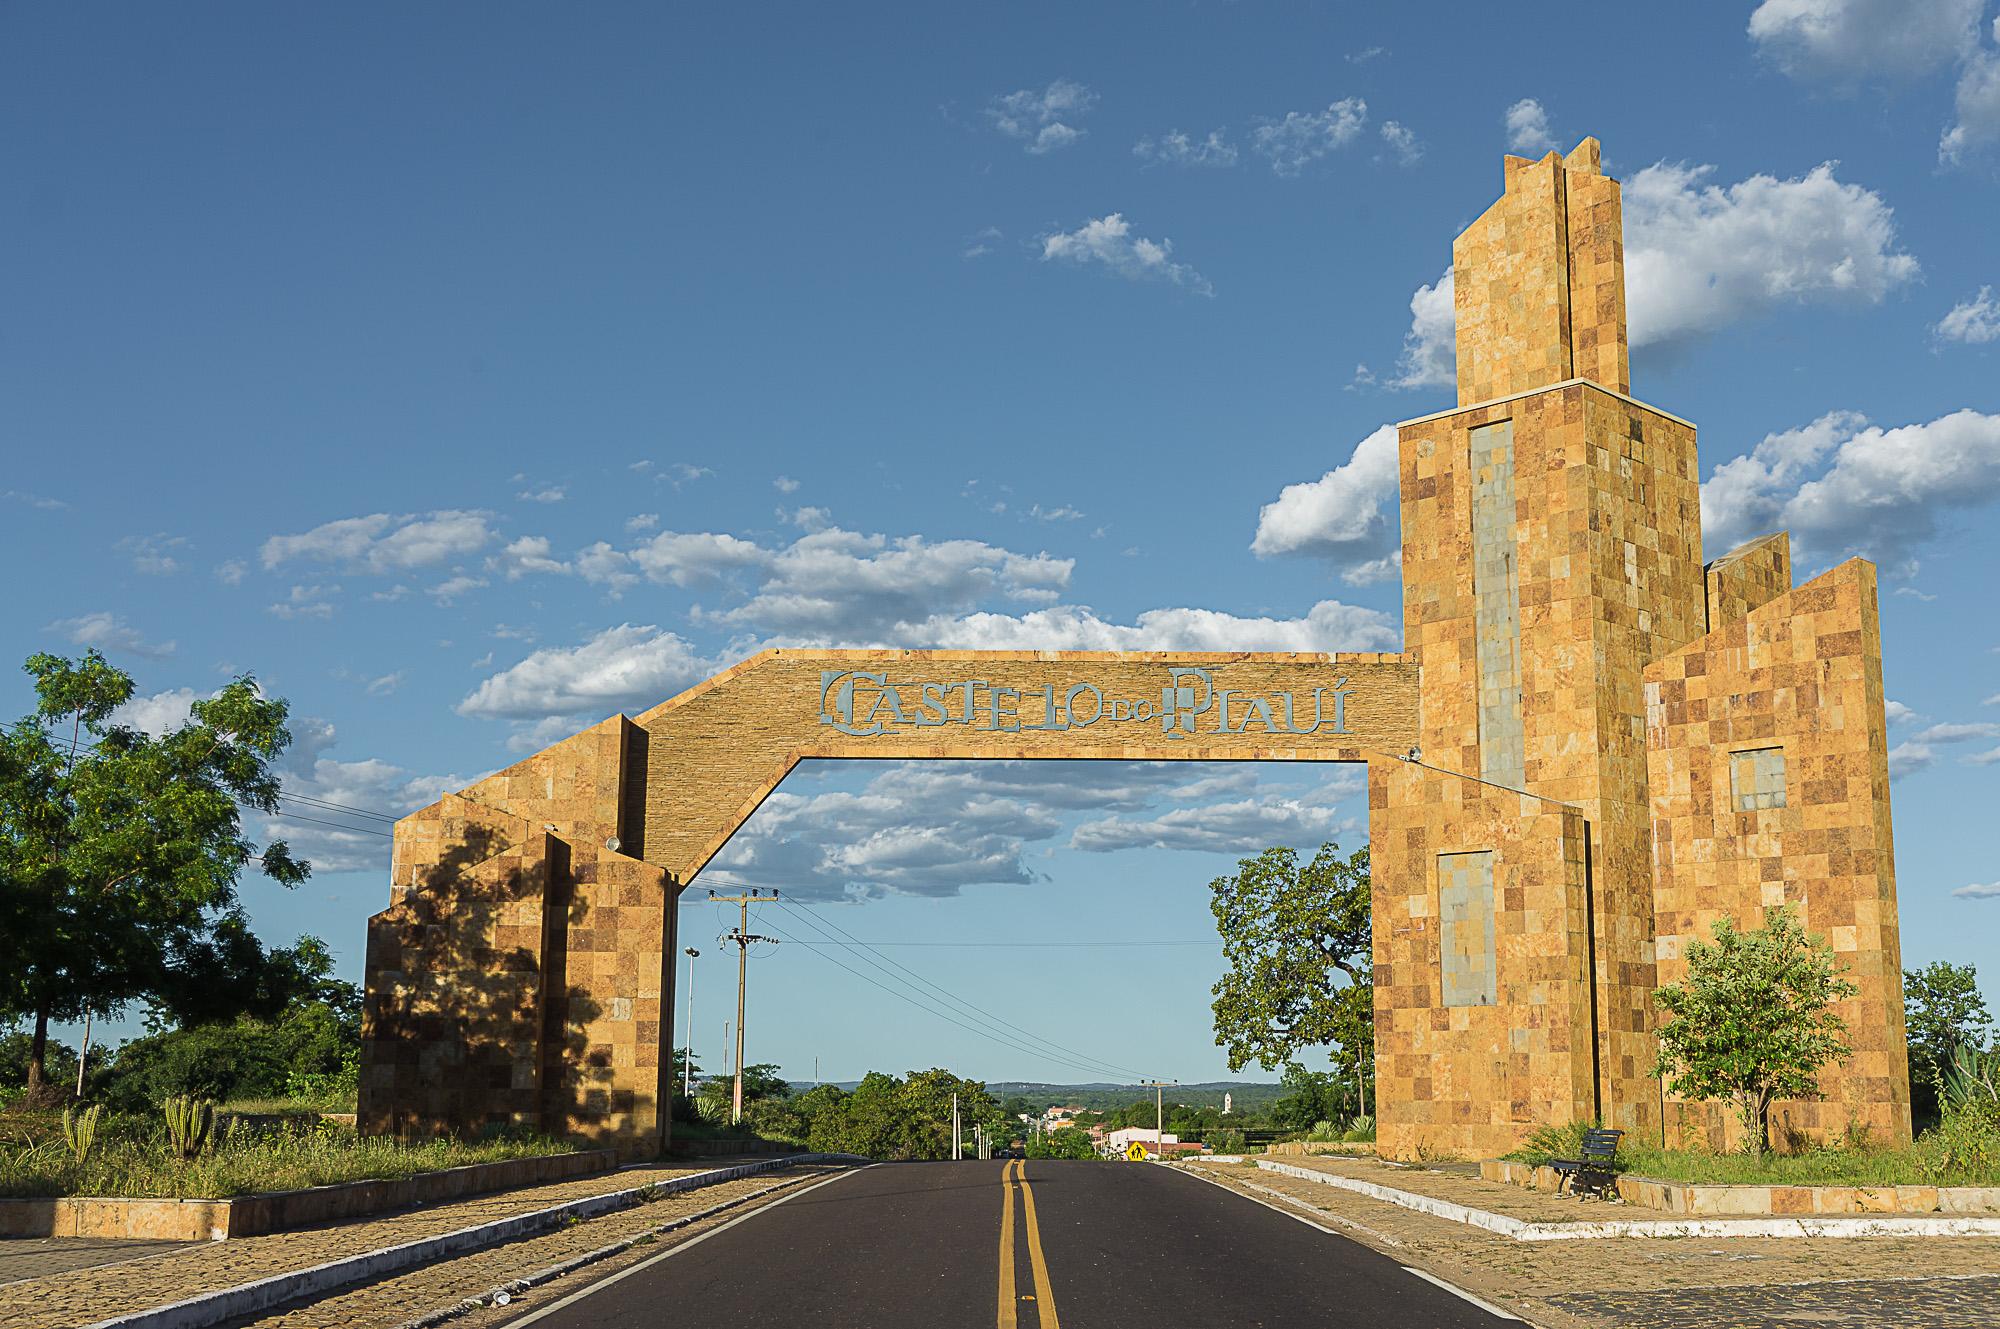 c180e1591eb Pórtico da entrada da cidade de Castelo do Piauí